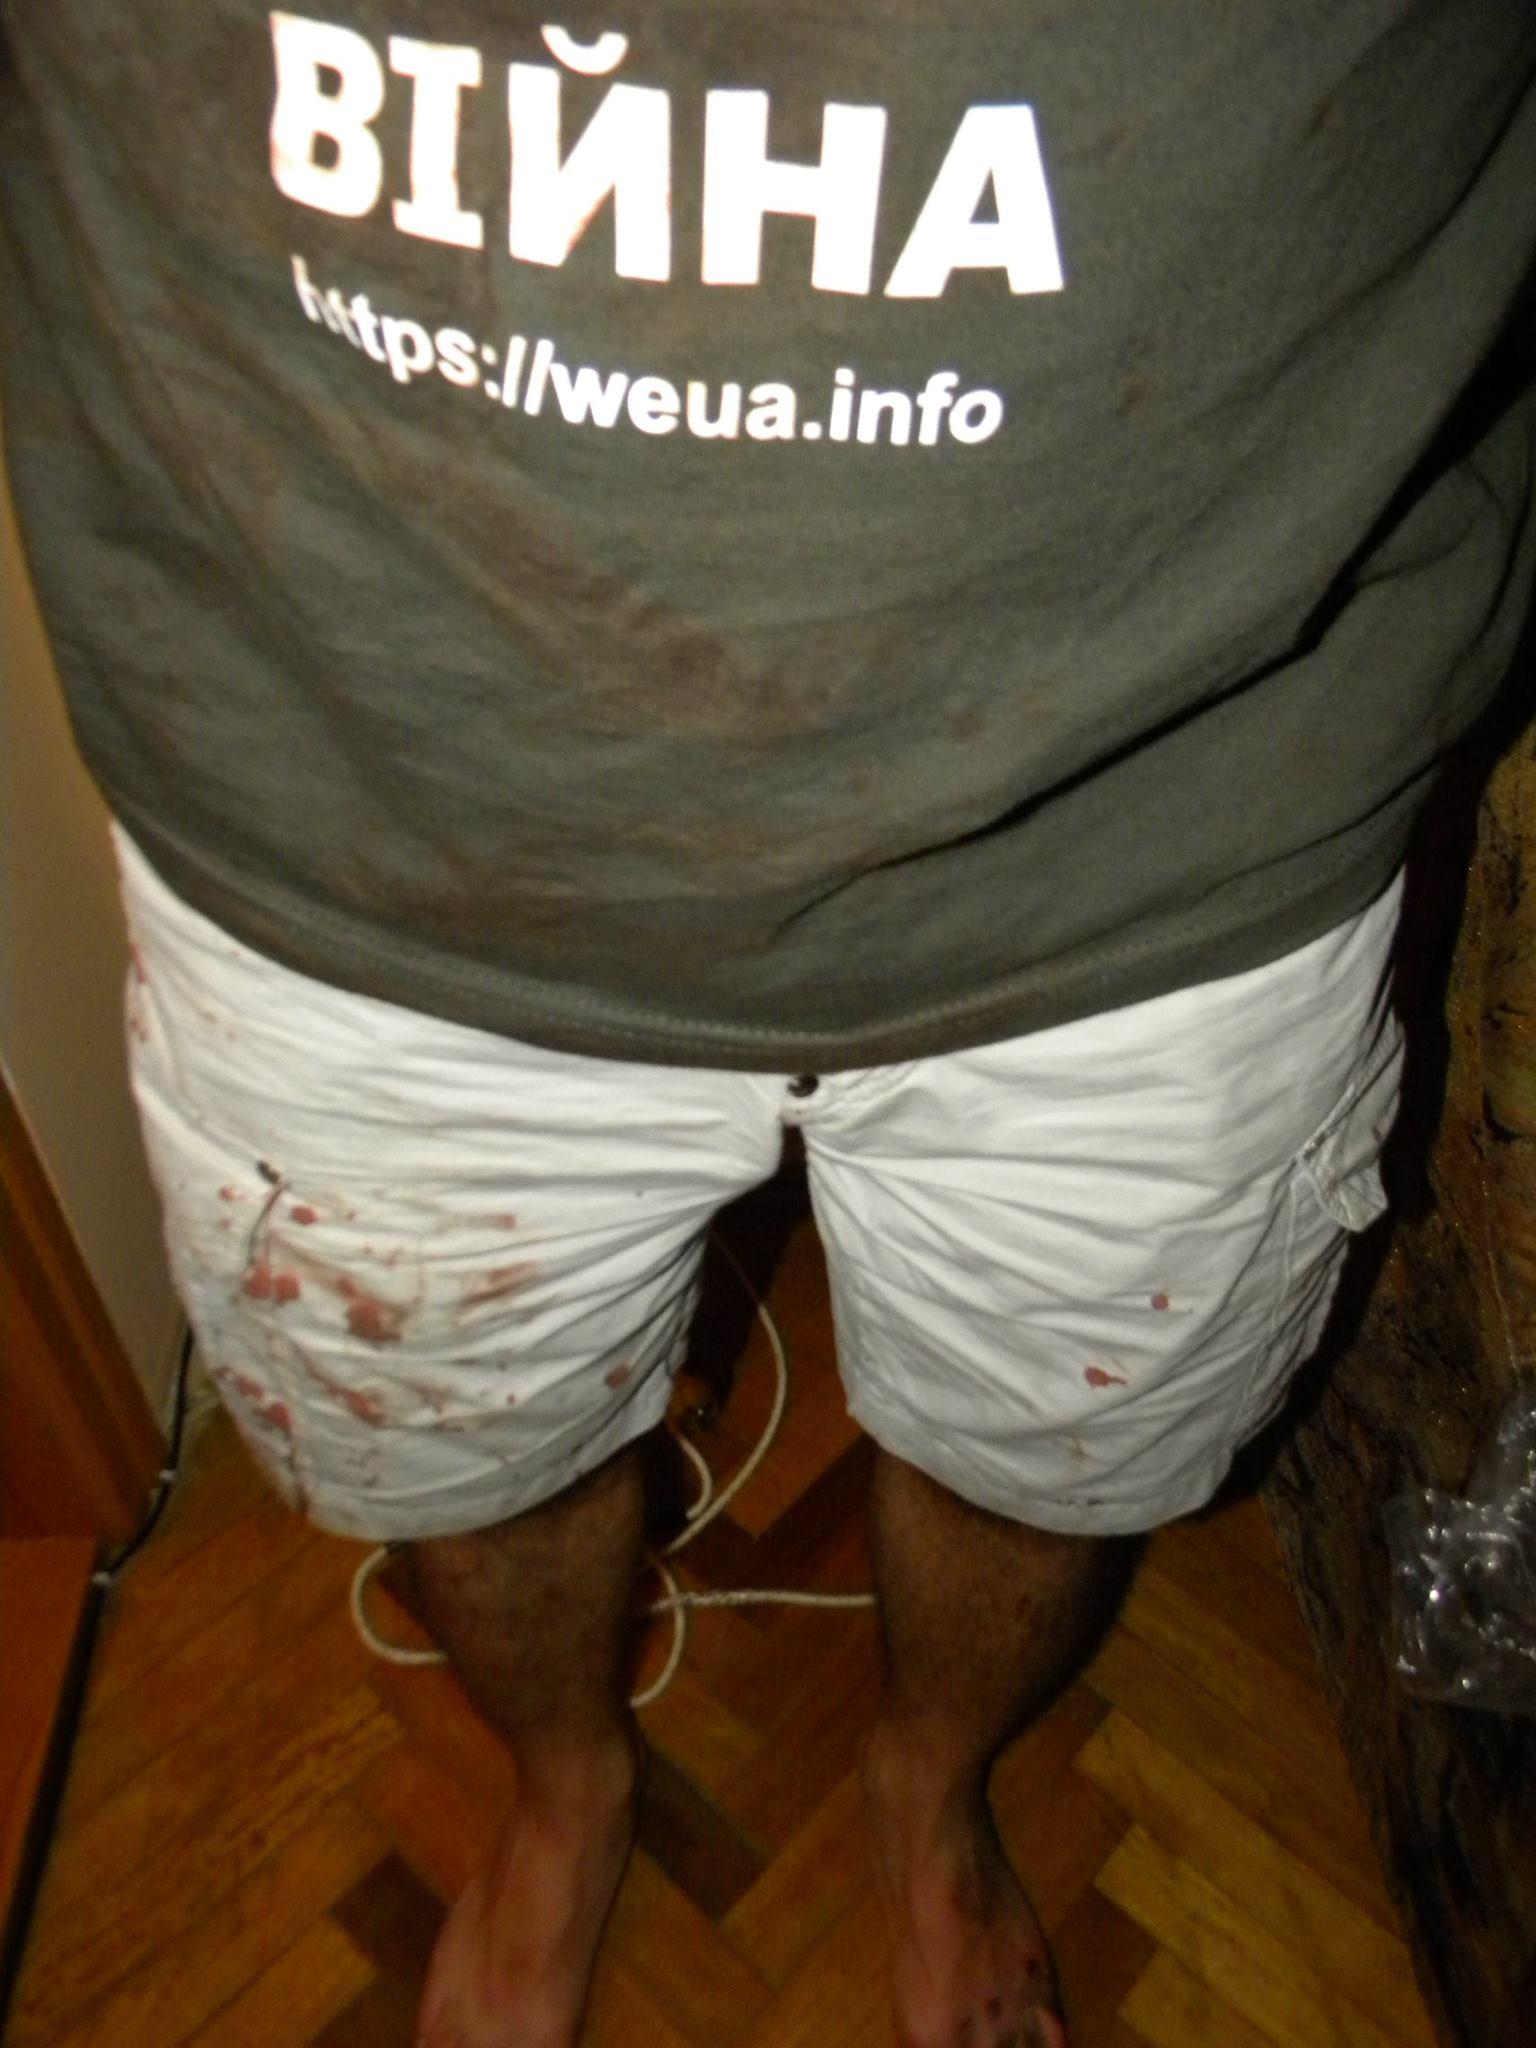 ФОТО: Во Львове избивают жителей с криками «Слава Путину!»